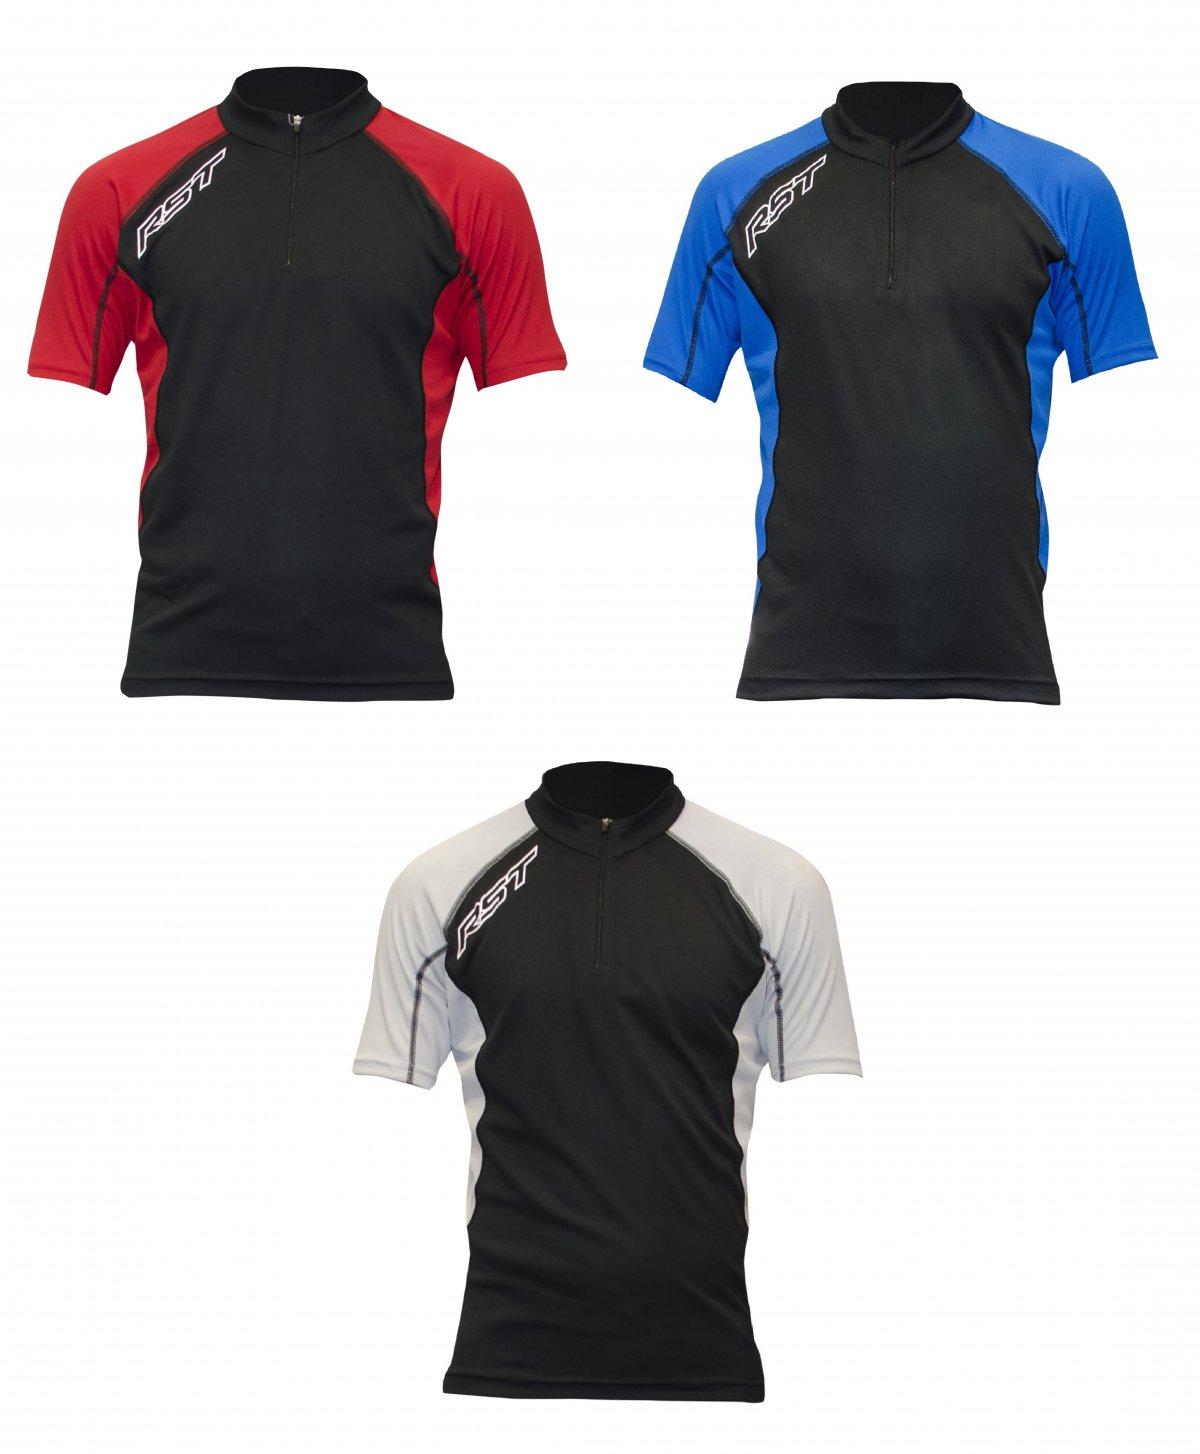 Rst Premium Line Short Sleeve Jersey Quarter Zip